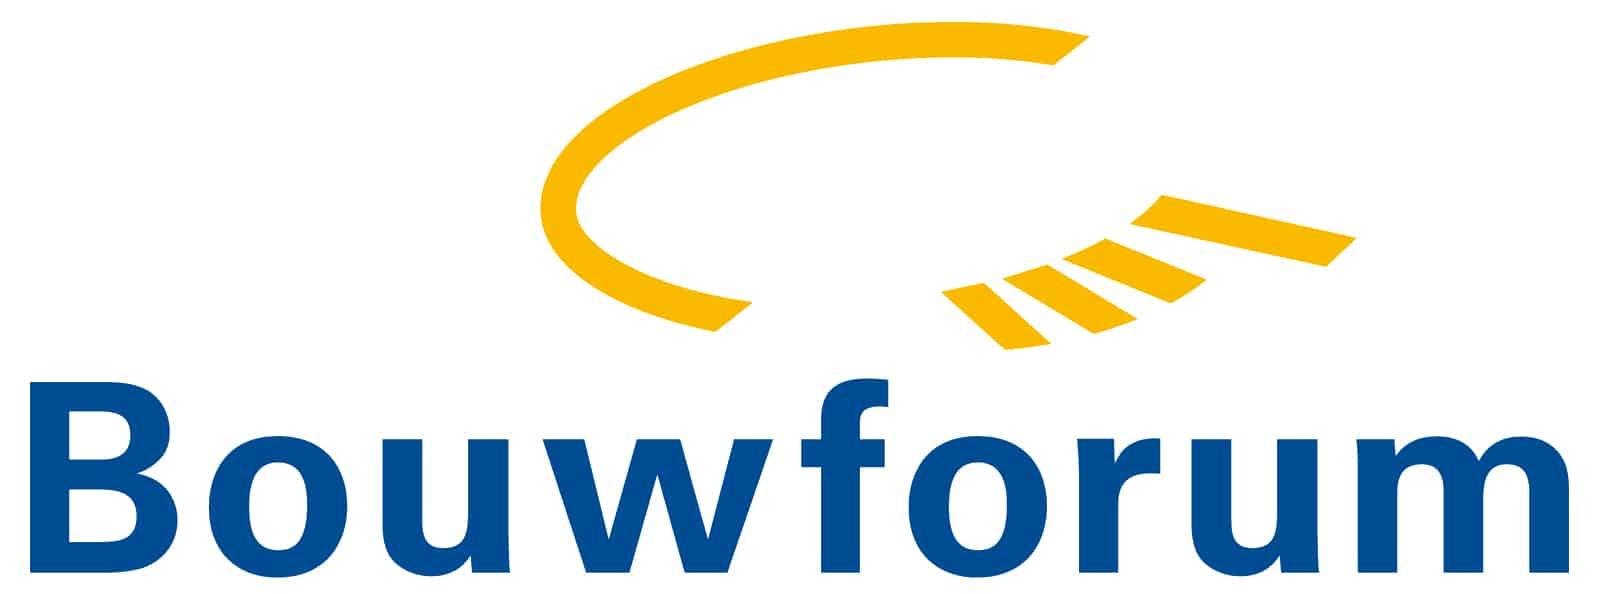 Bouwforum_logo-2